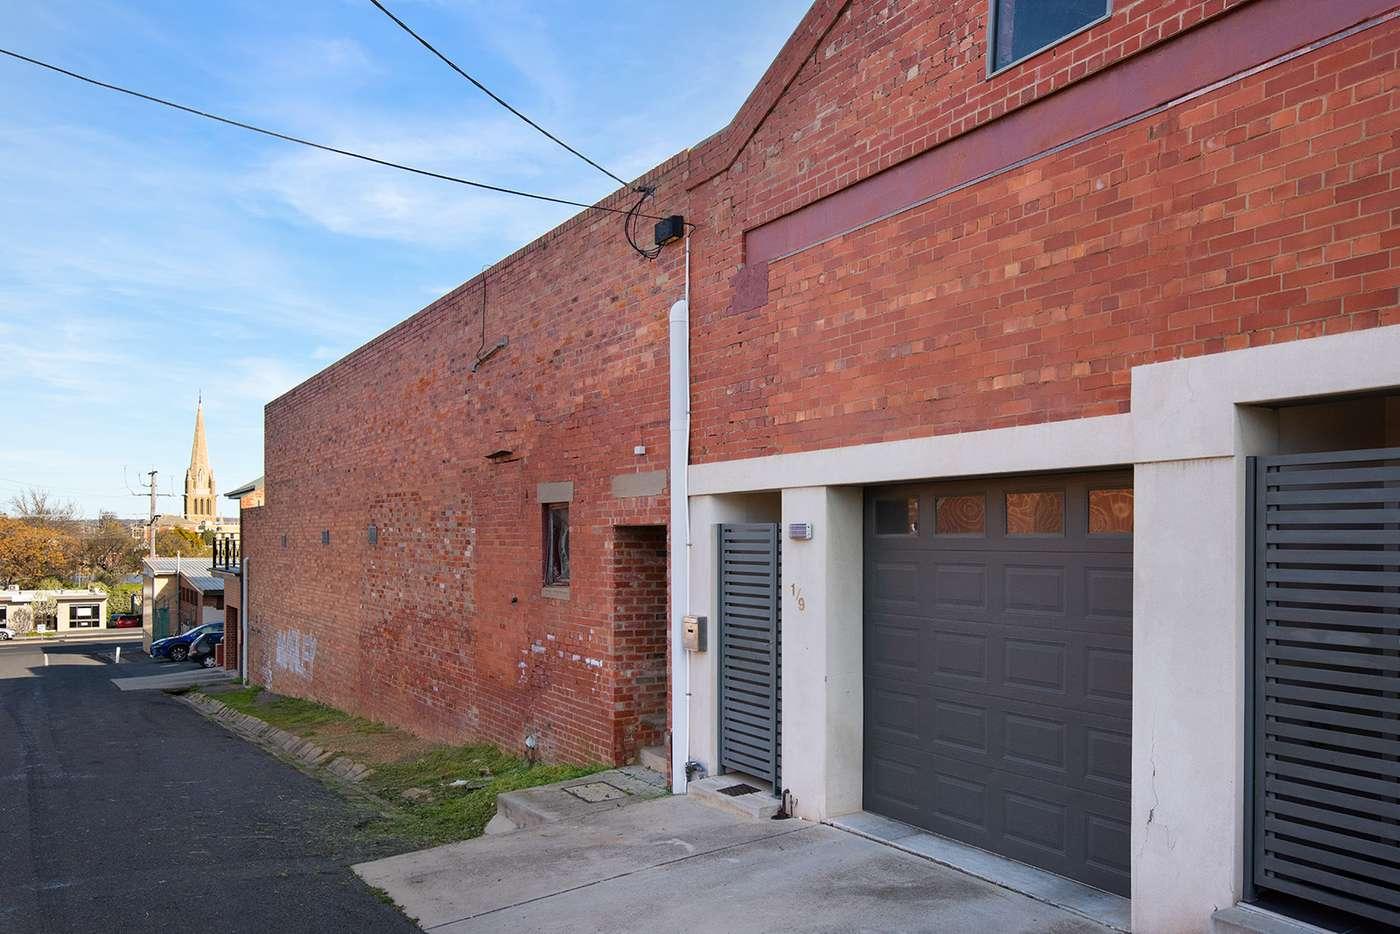 Main view of Homely townhouse listing, 1/9 Acacia Street, Bendigo VIC 3550